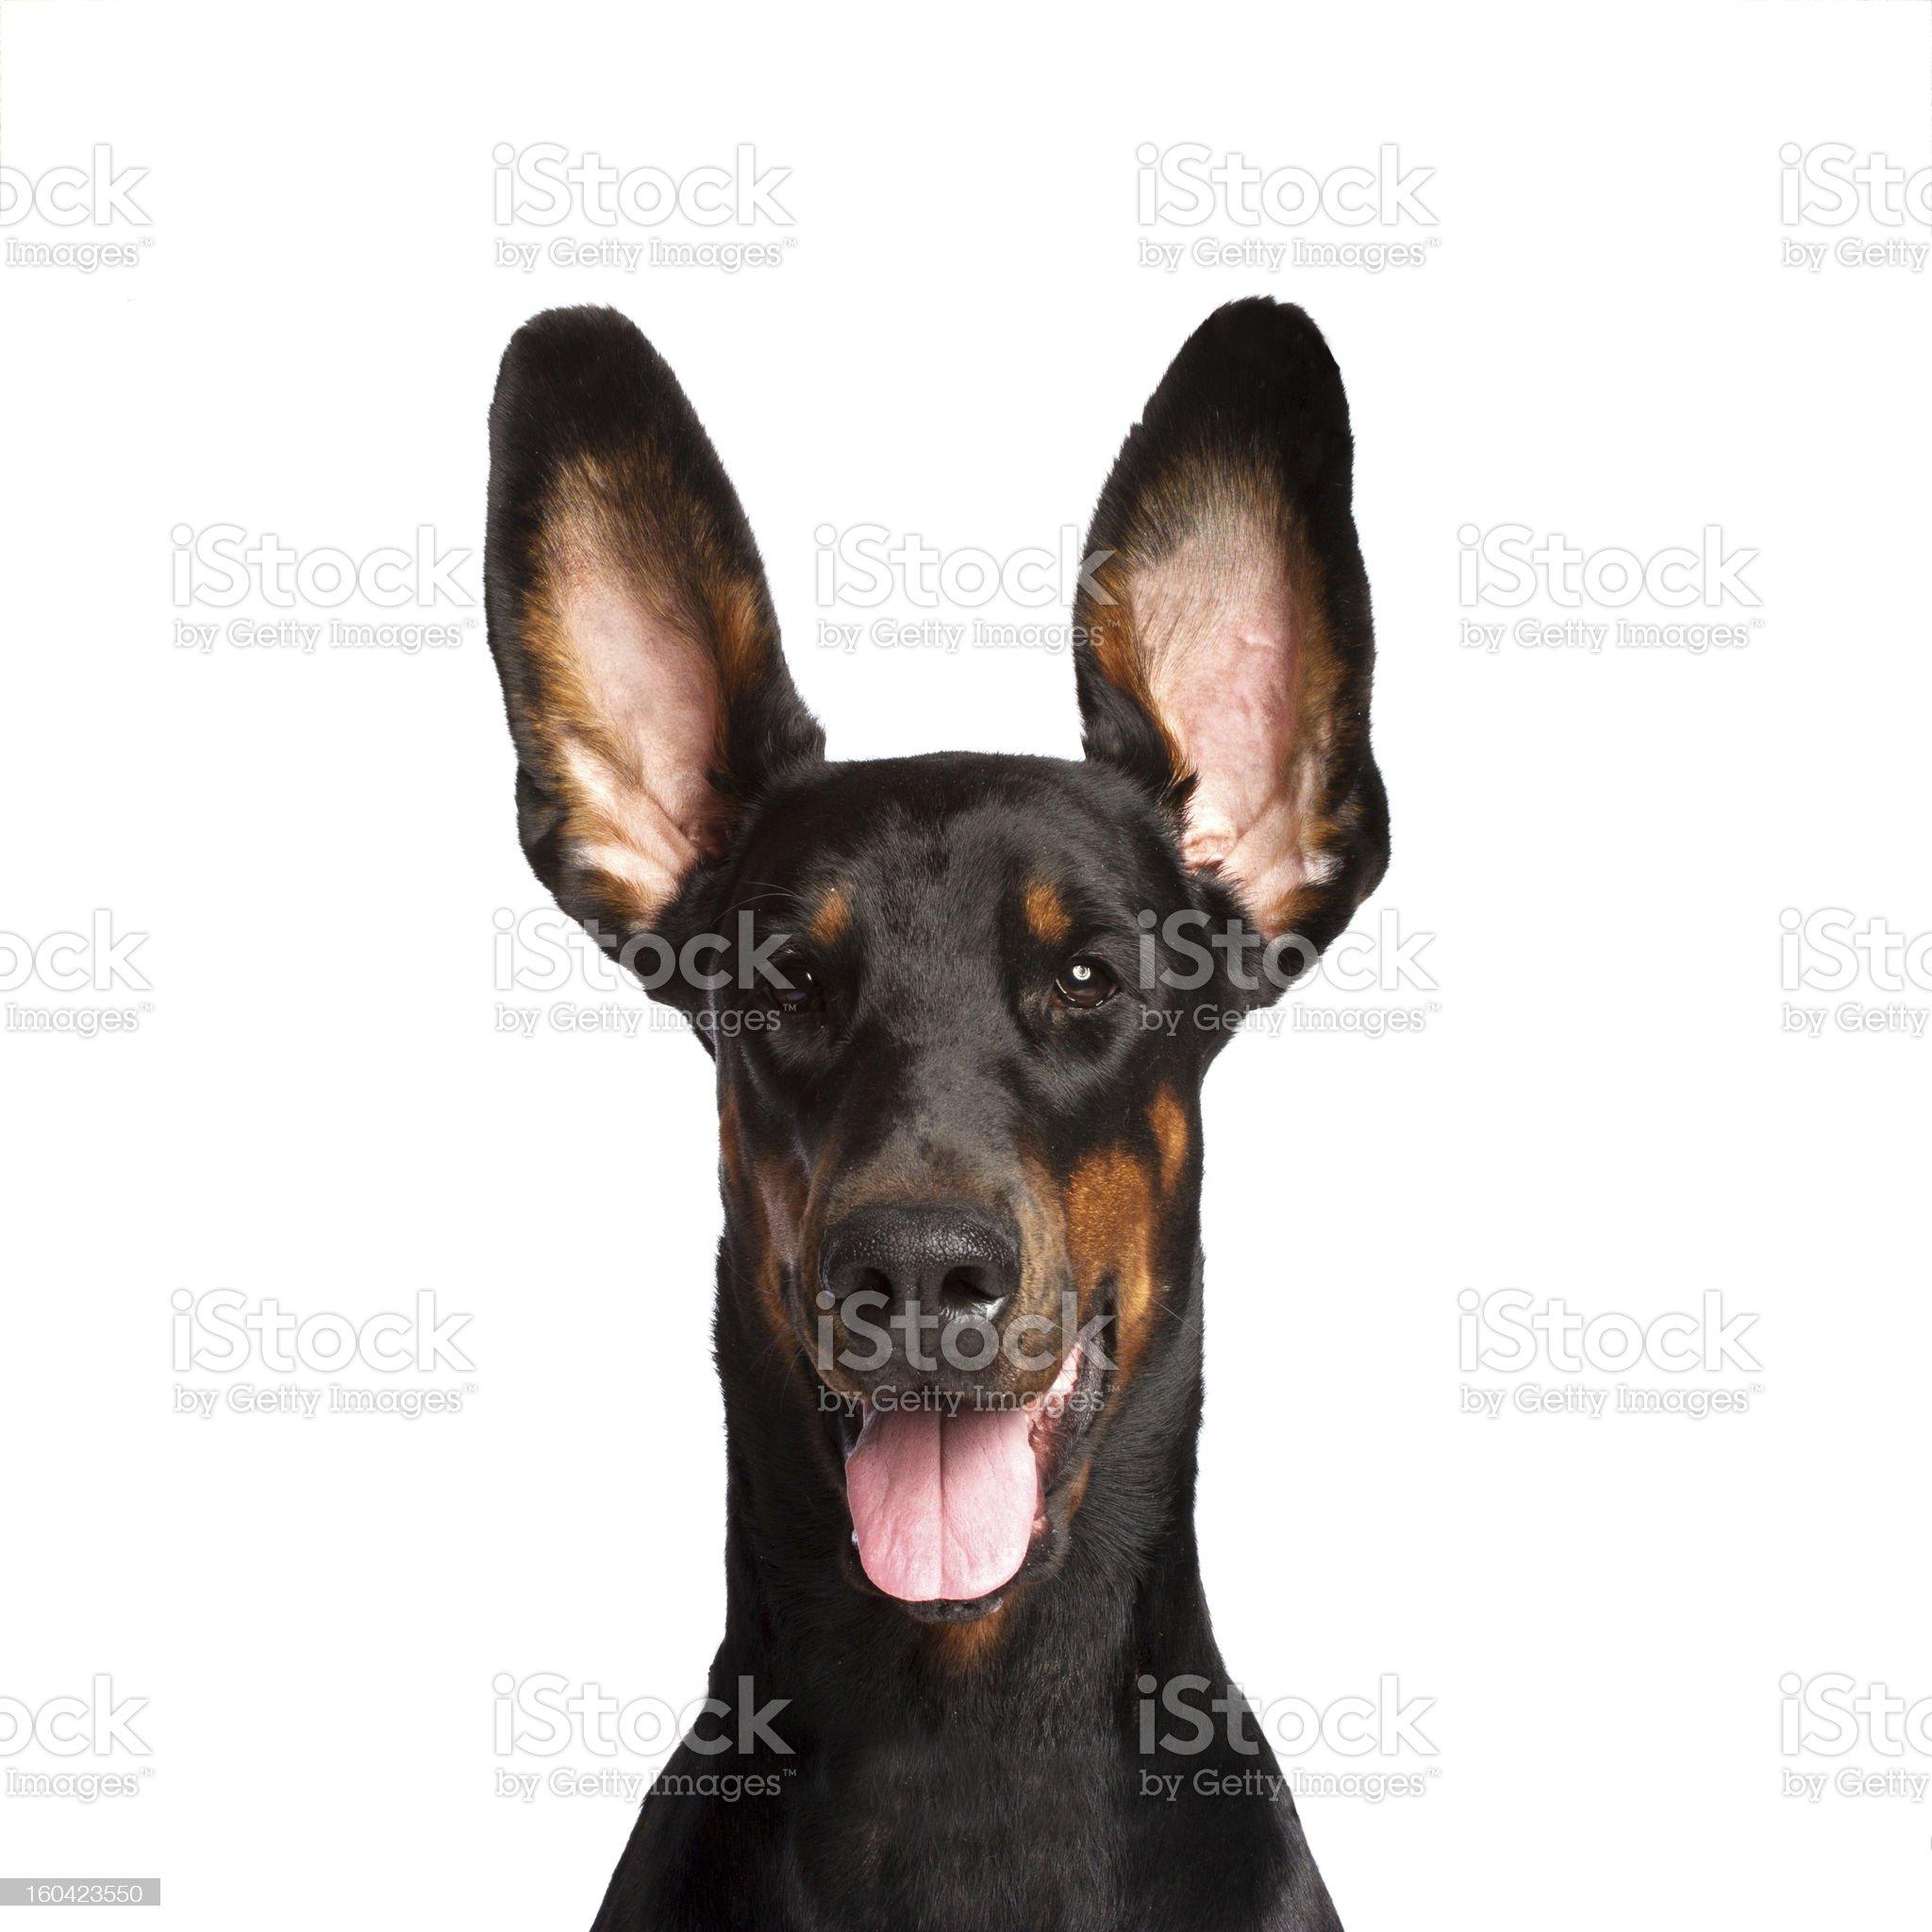 Cute ears of dobermann dog royalty-free stock photo